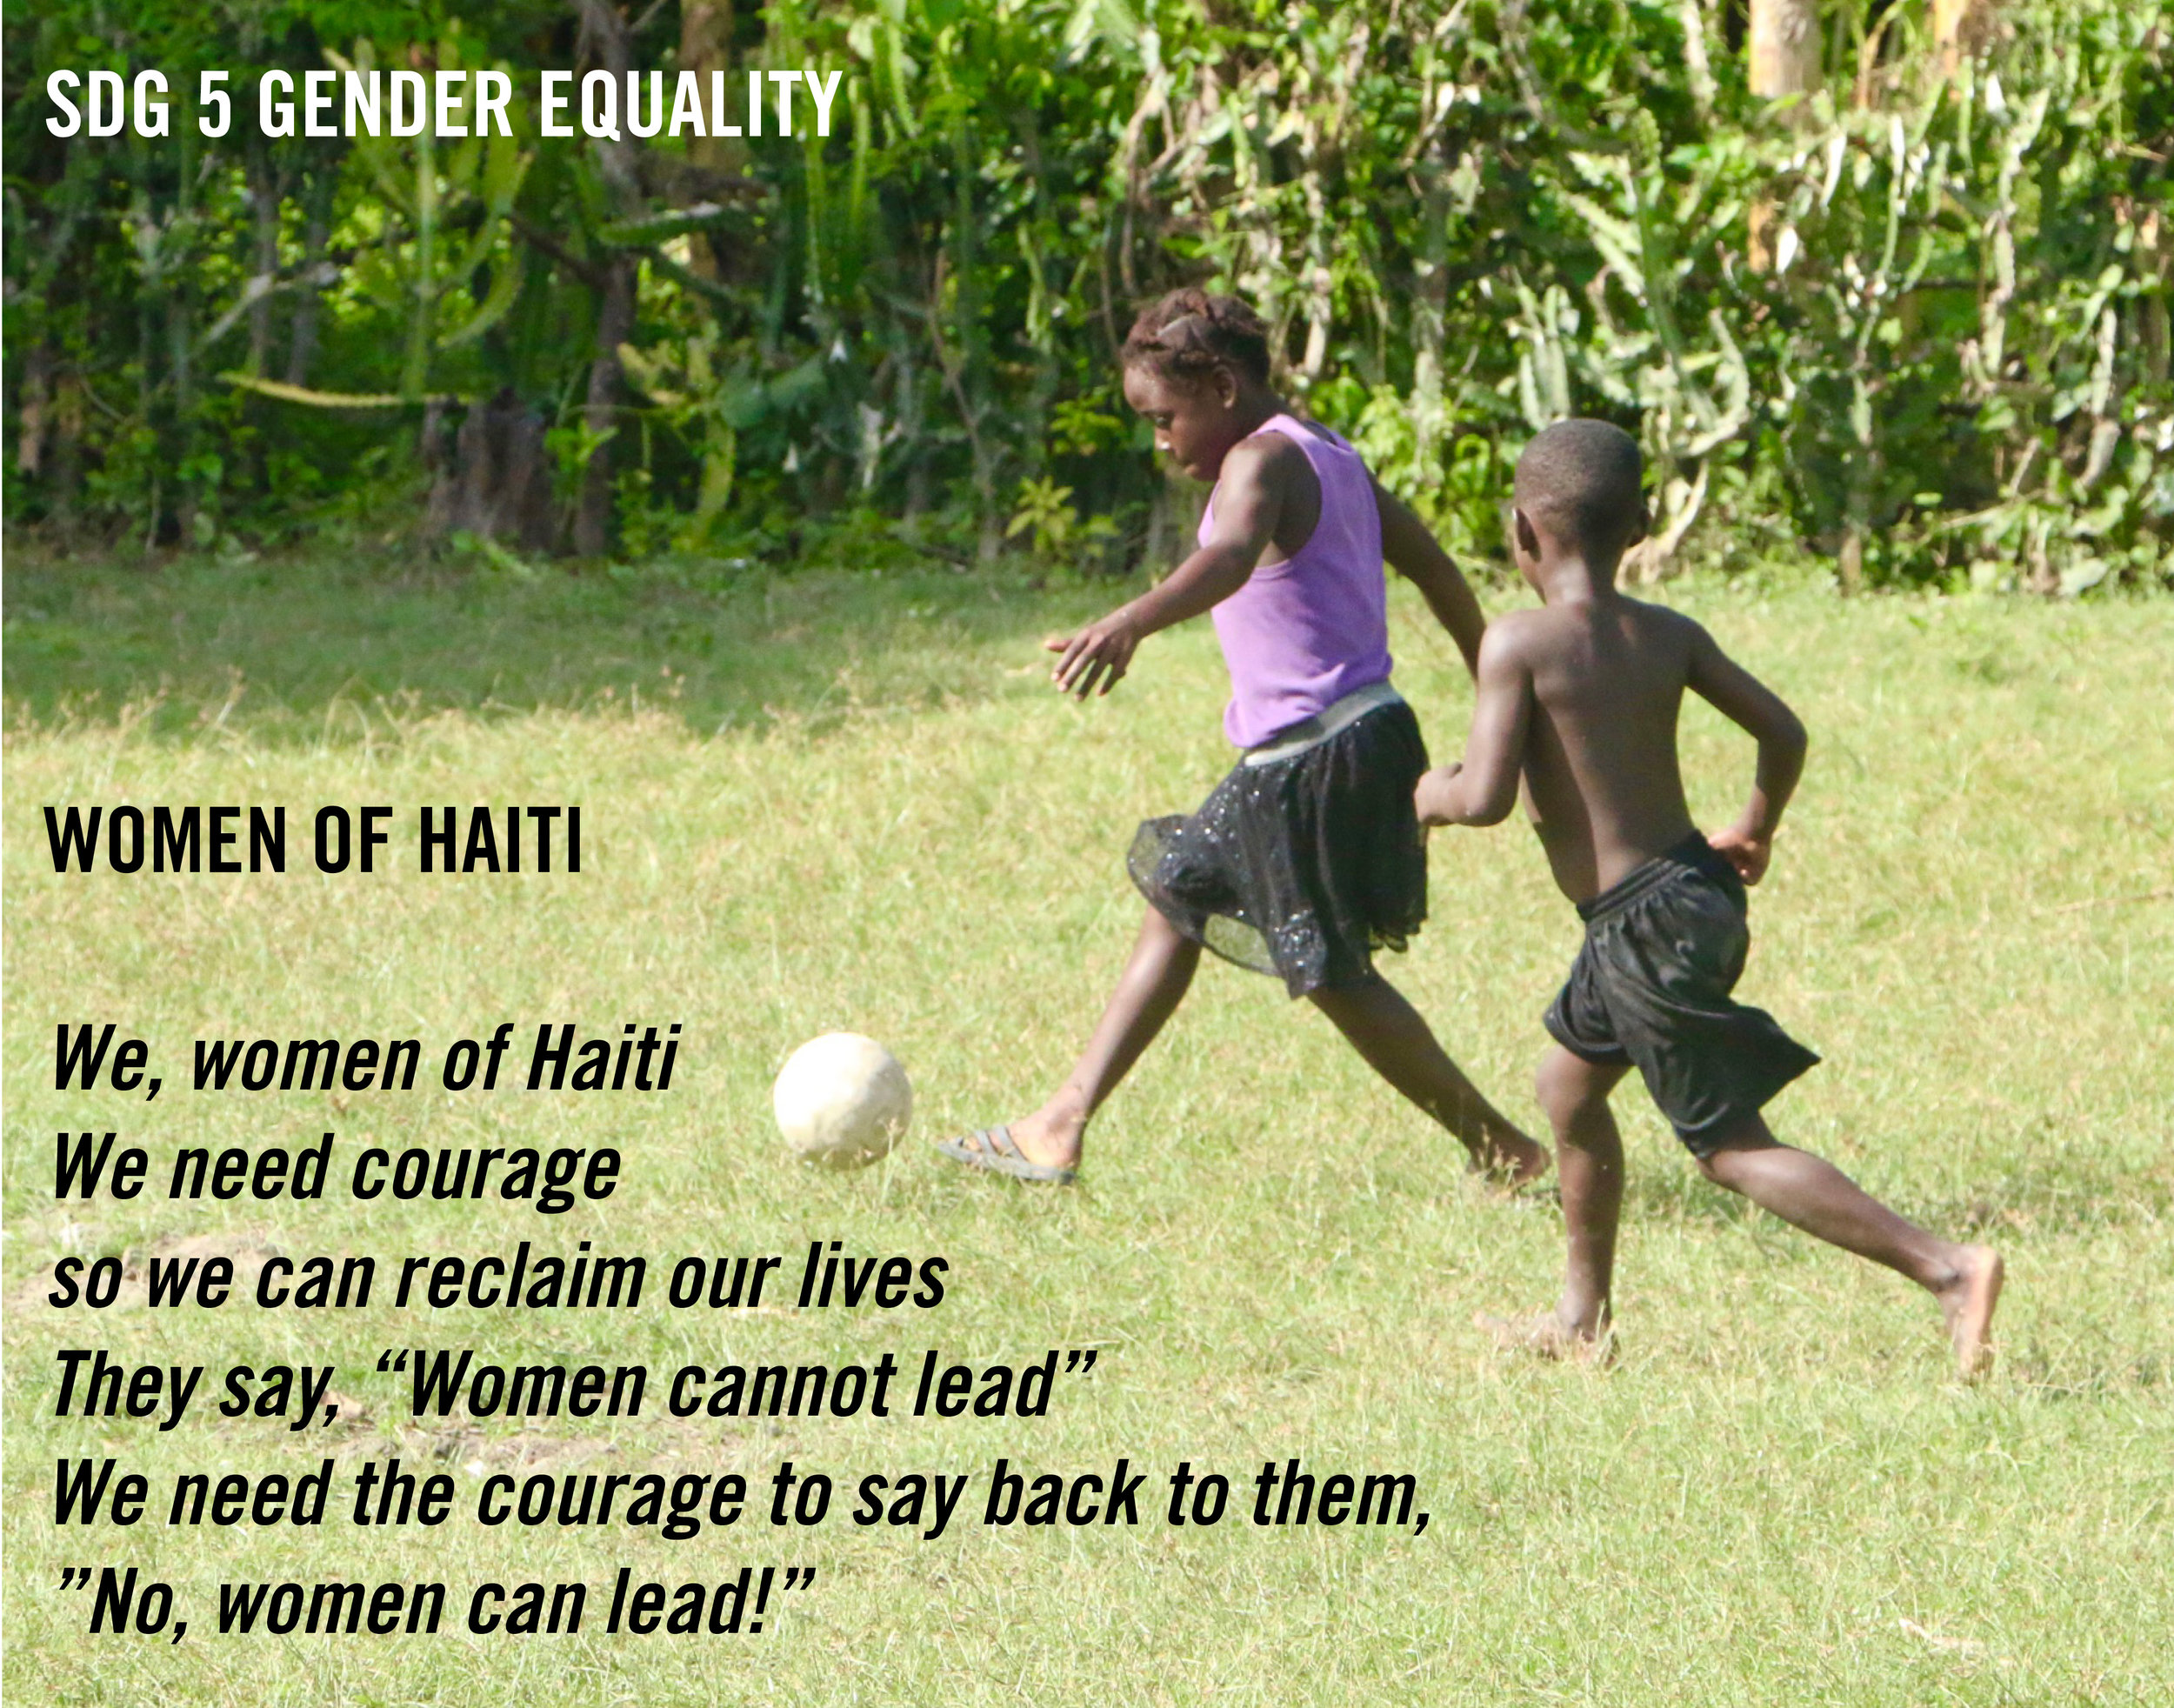 Poetry by Junia, age 16, Gonaïves, Haiti